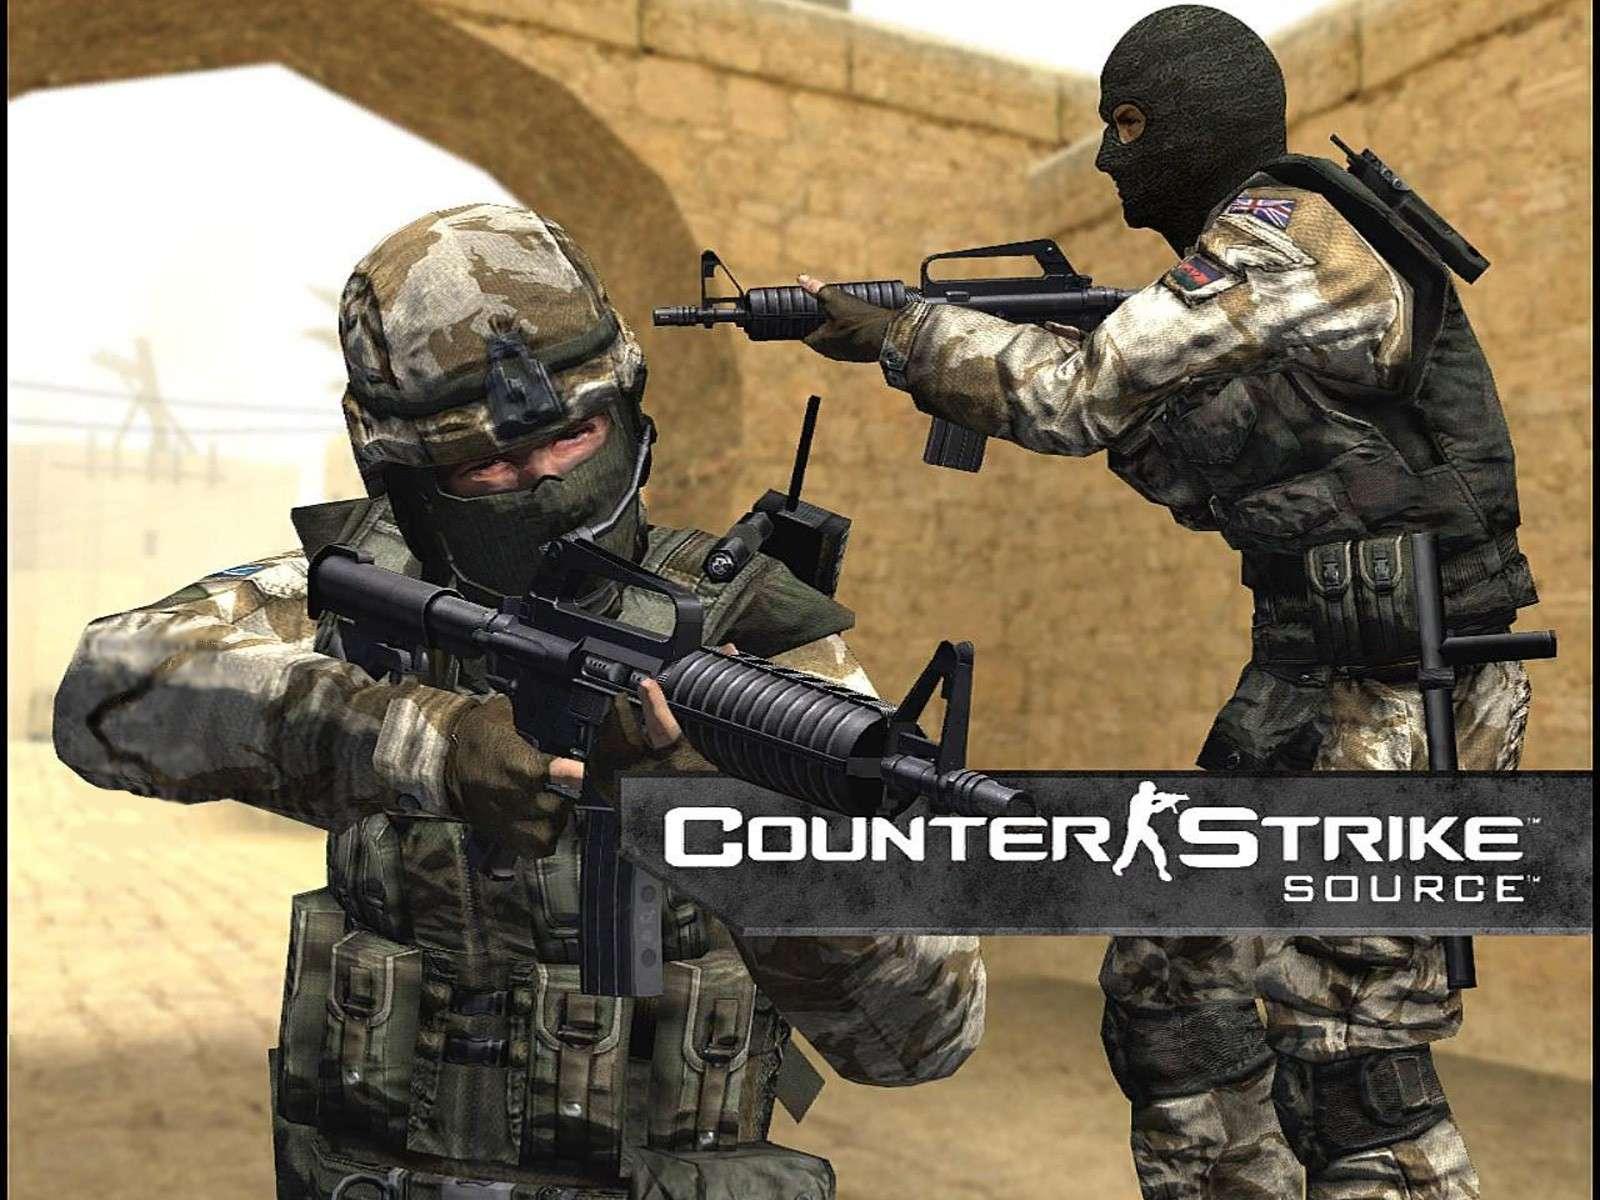 Самая последняя версия игры Counter-Strike Source 10.0.0.58 No-Steam